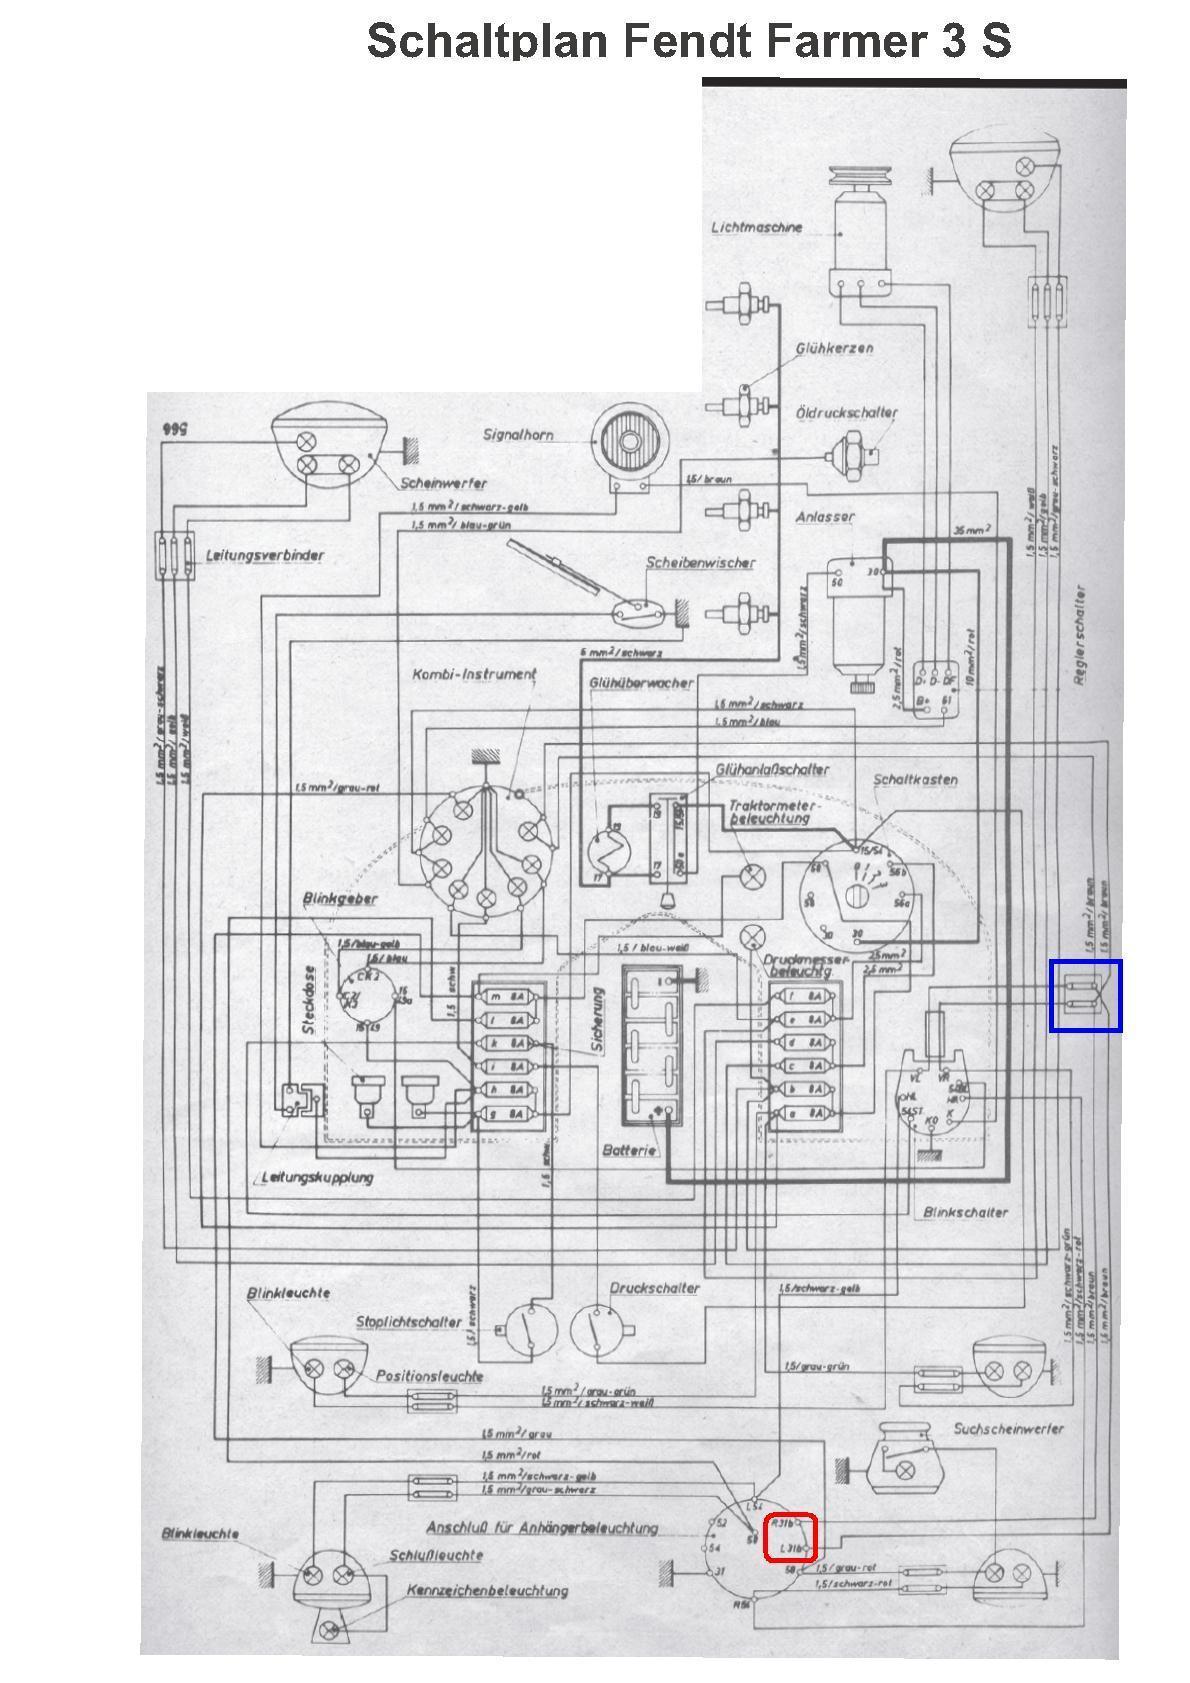 Diagram Volvo F12 Wiring Diagram Full Version Hd Quality Wiring Diagram Diagramtisar Corocrozdalastria It